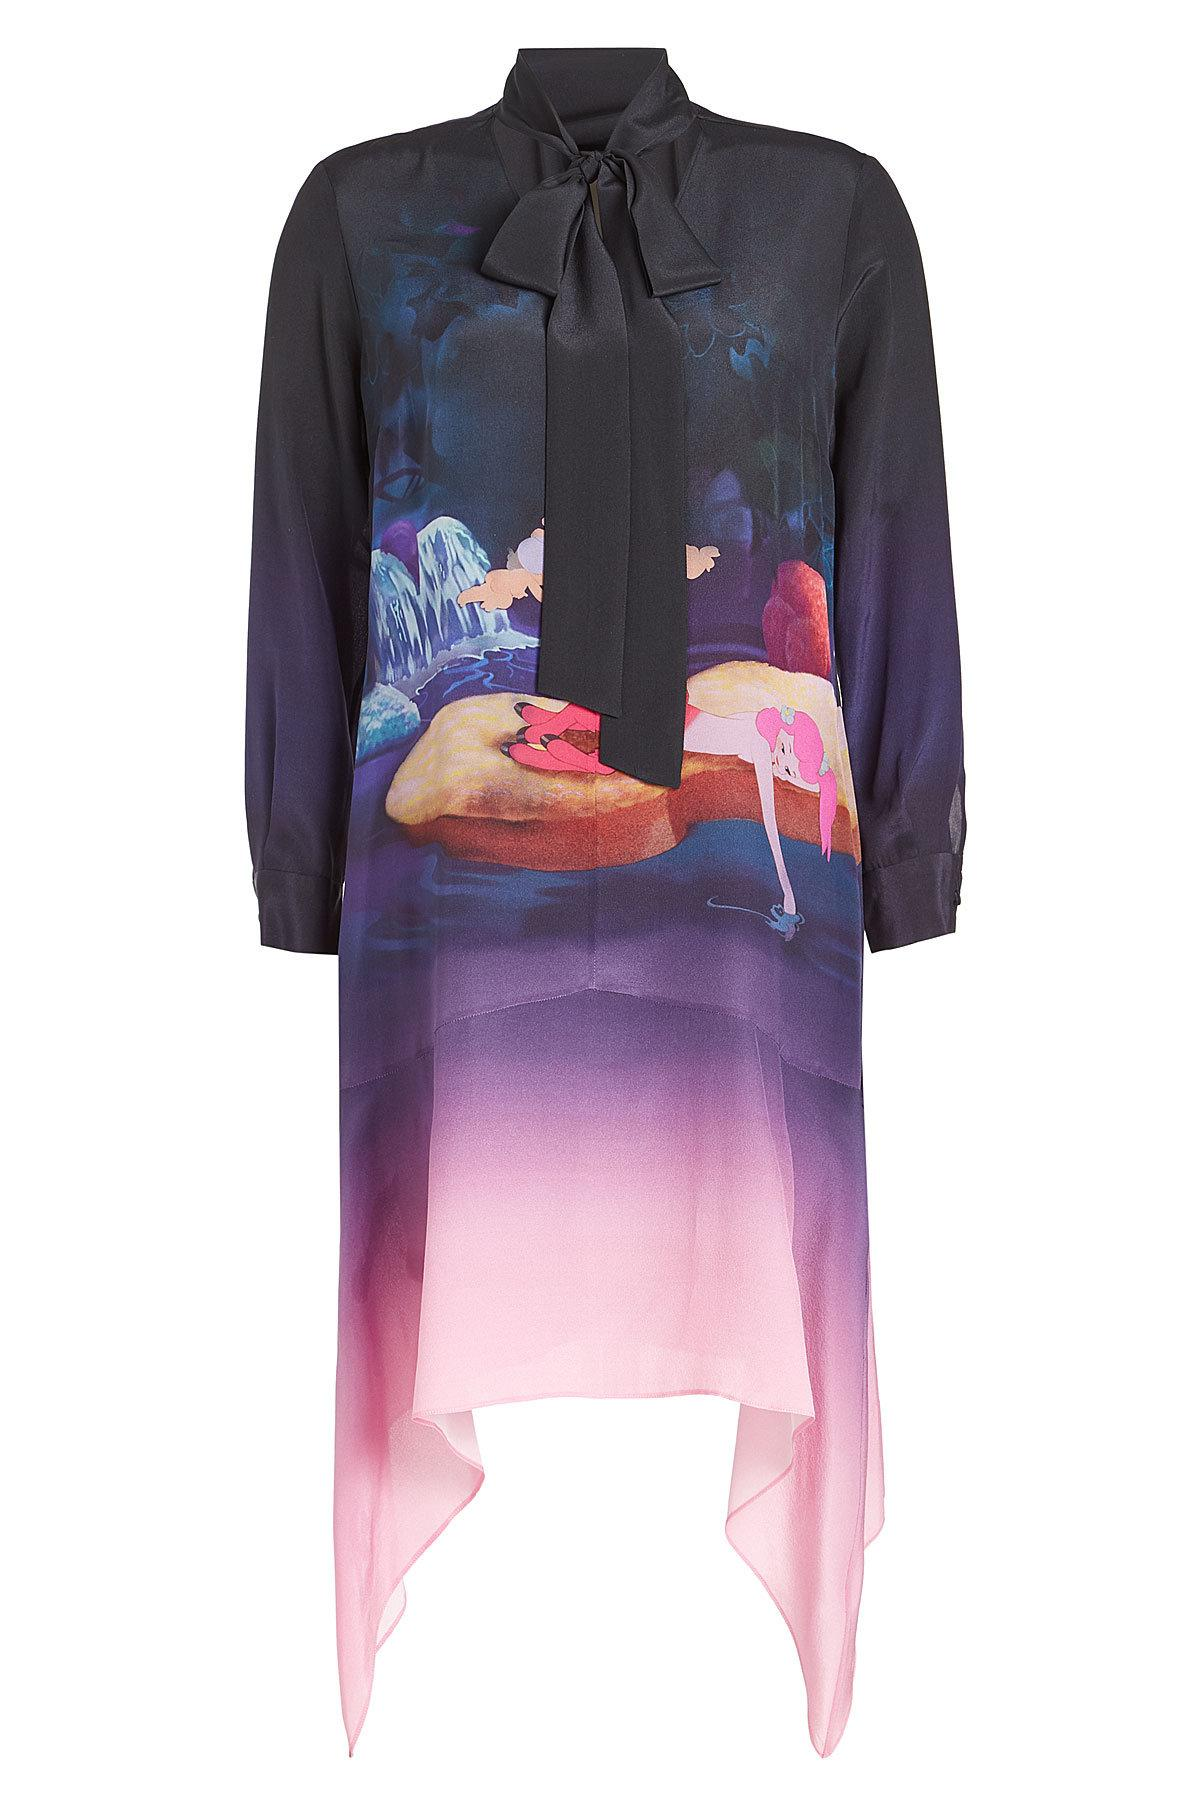 Mary Katrantzou Printed Silk Dress With Handkerchief Hem In Multicolored